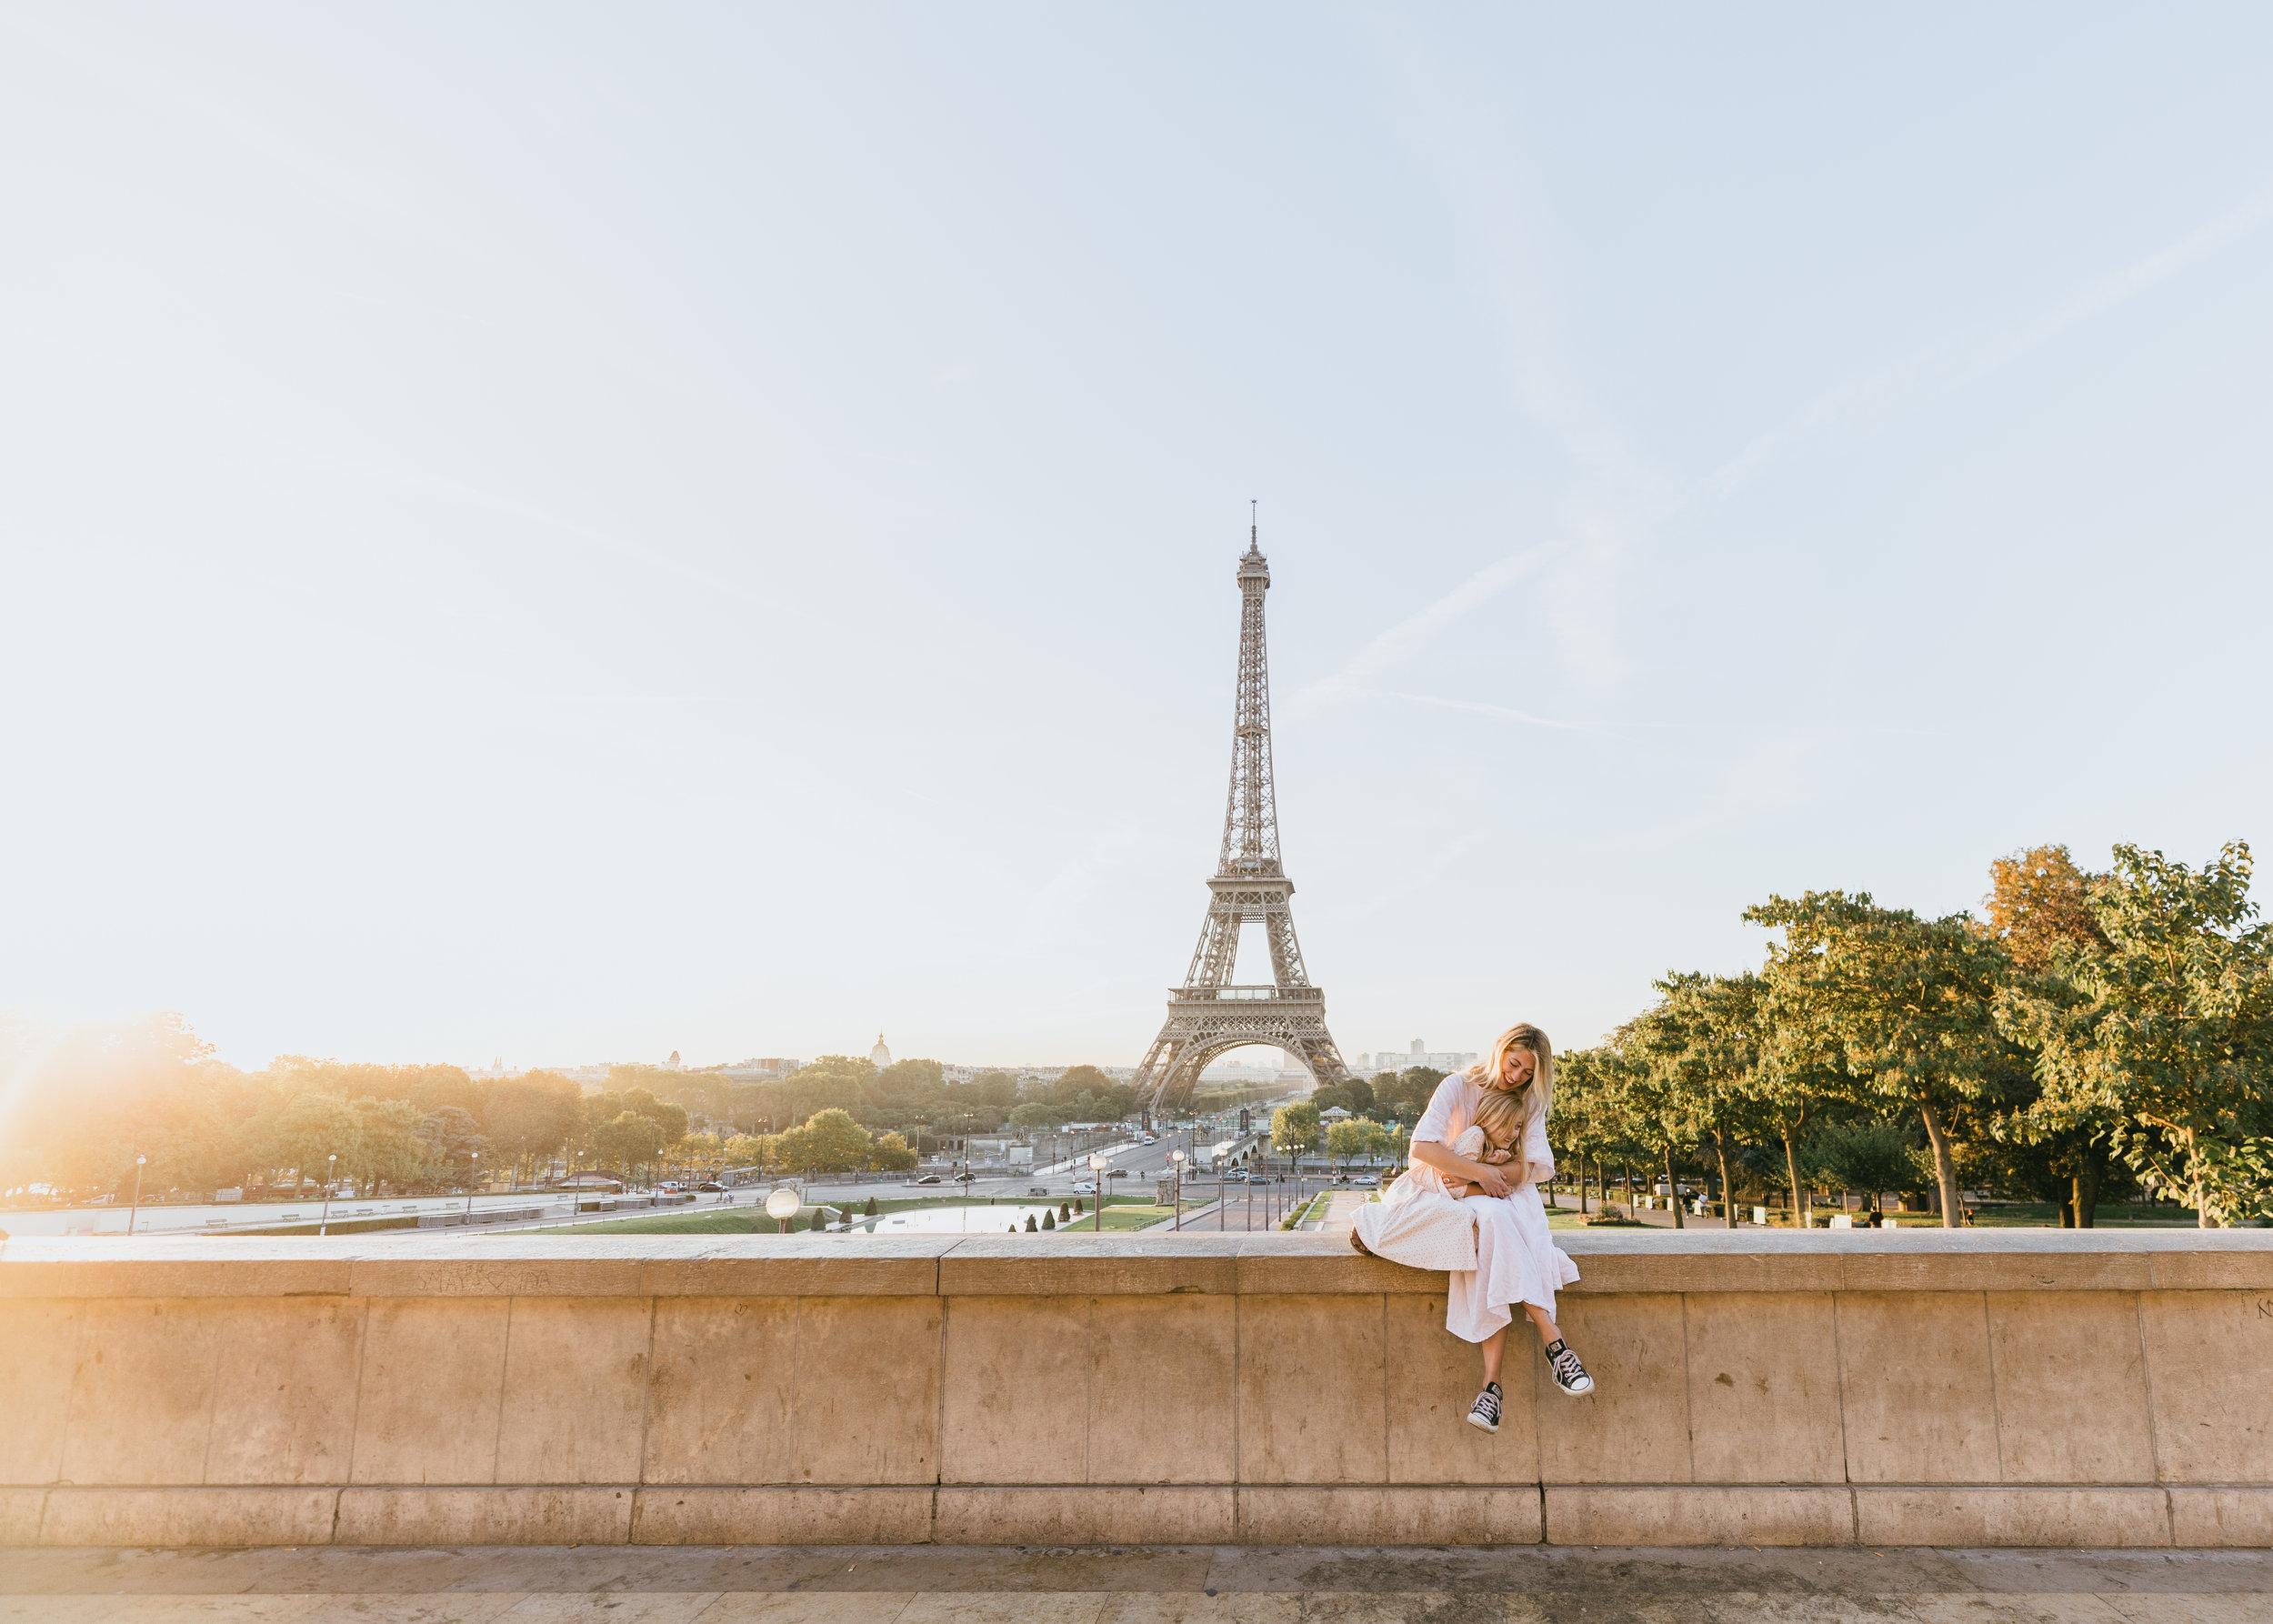 paris family photo session